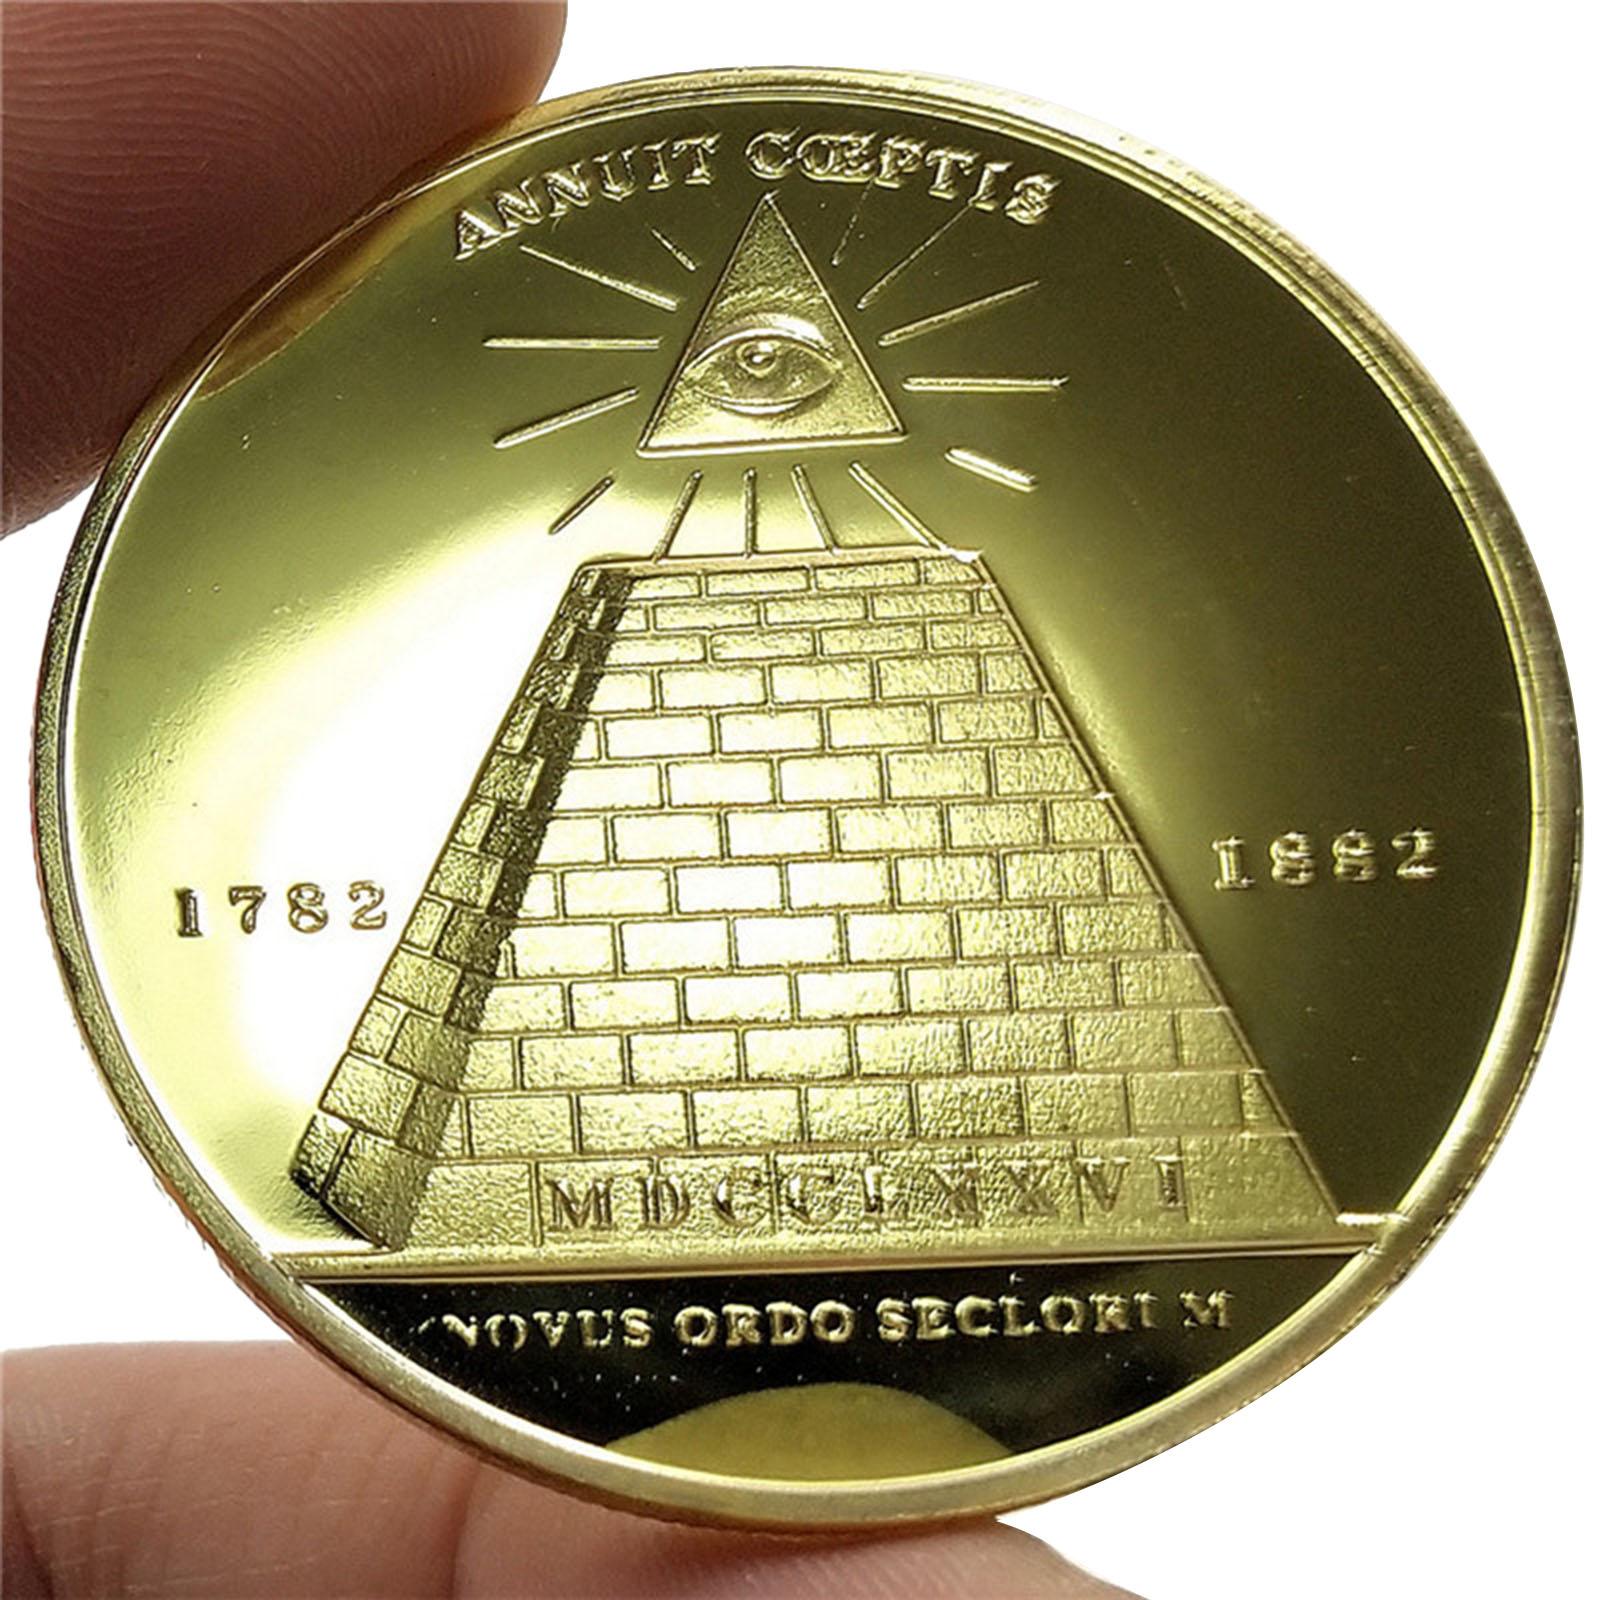 Памятная монета масонский глаз, пирамида, круглая Золотая монета, коллекция монет